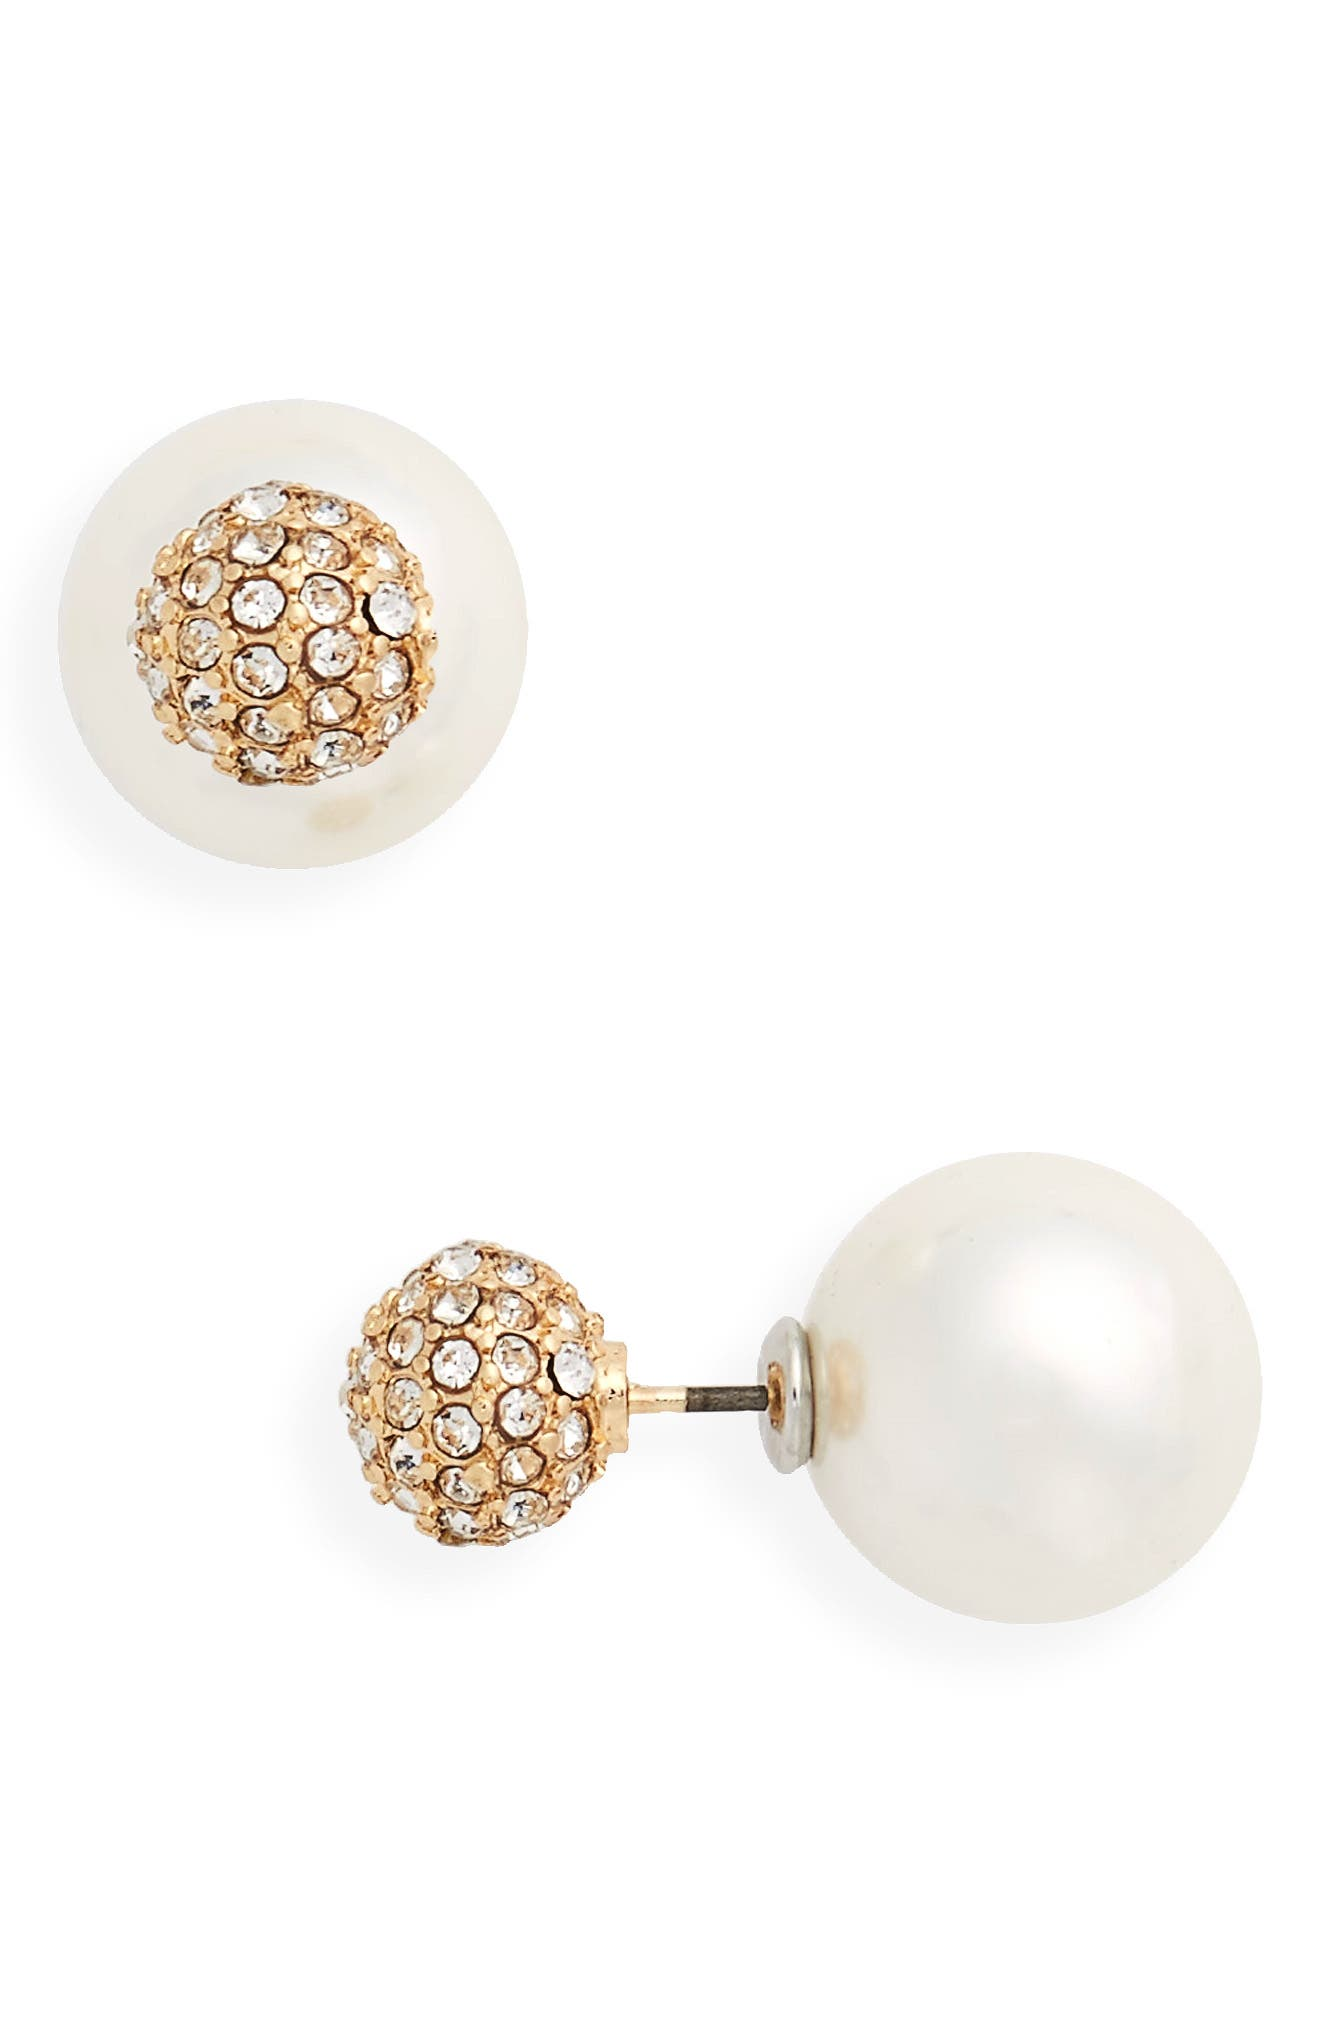 Imitation Pearl & Crystal Front/Back Earrings,                             Main thumbnail 1, color,                             100